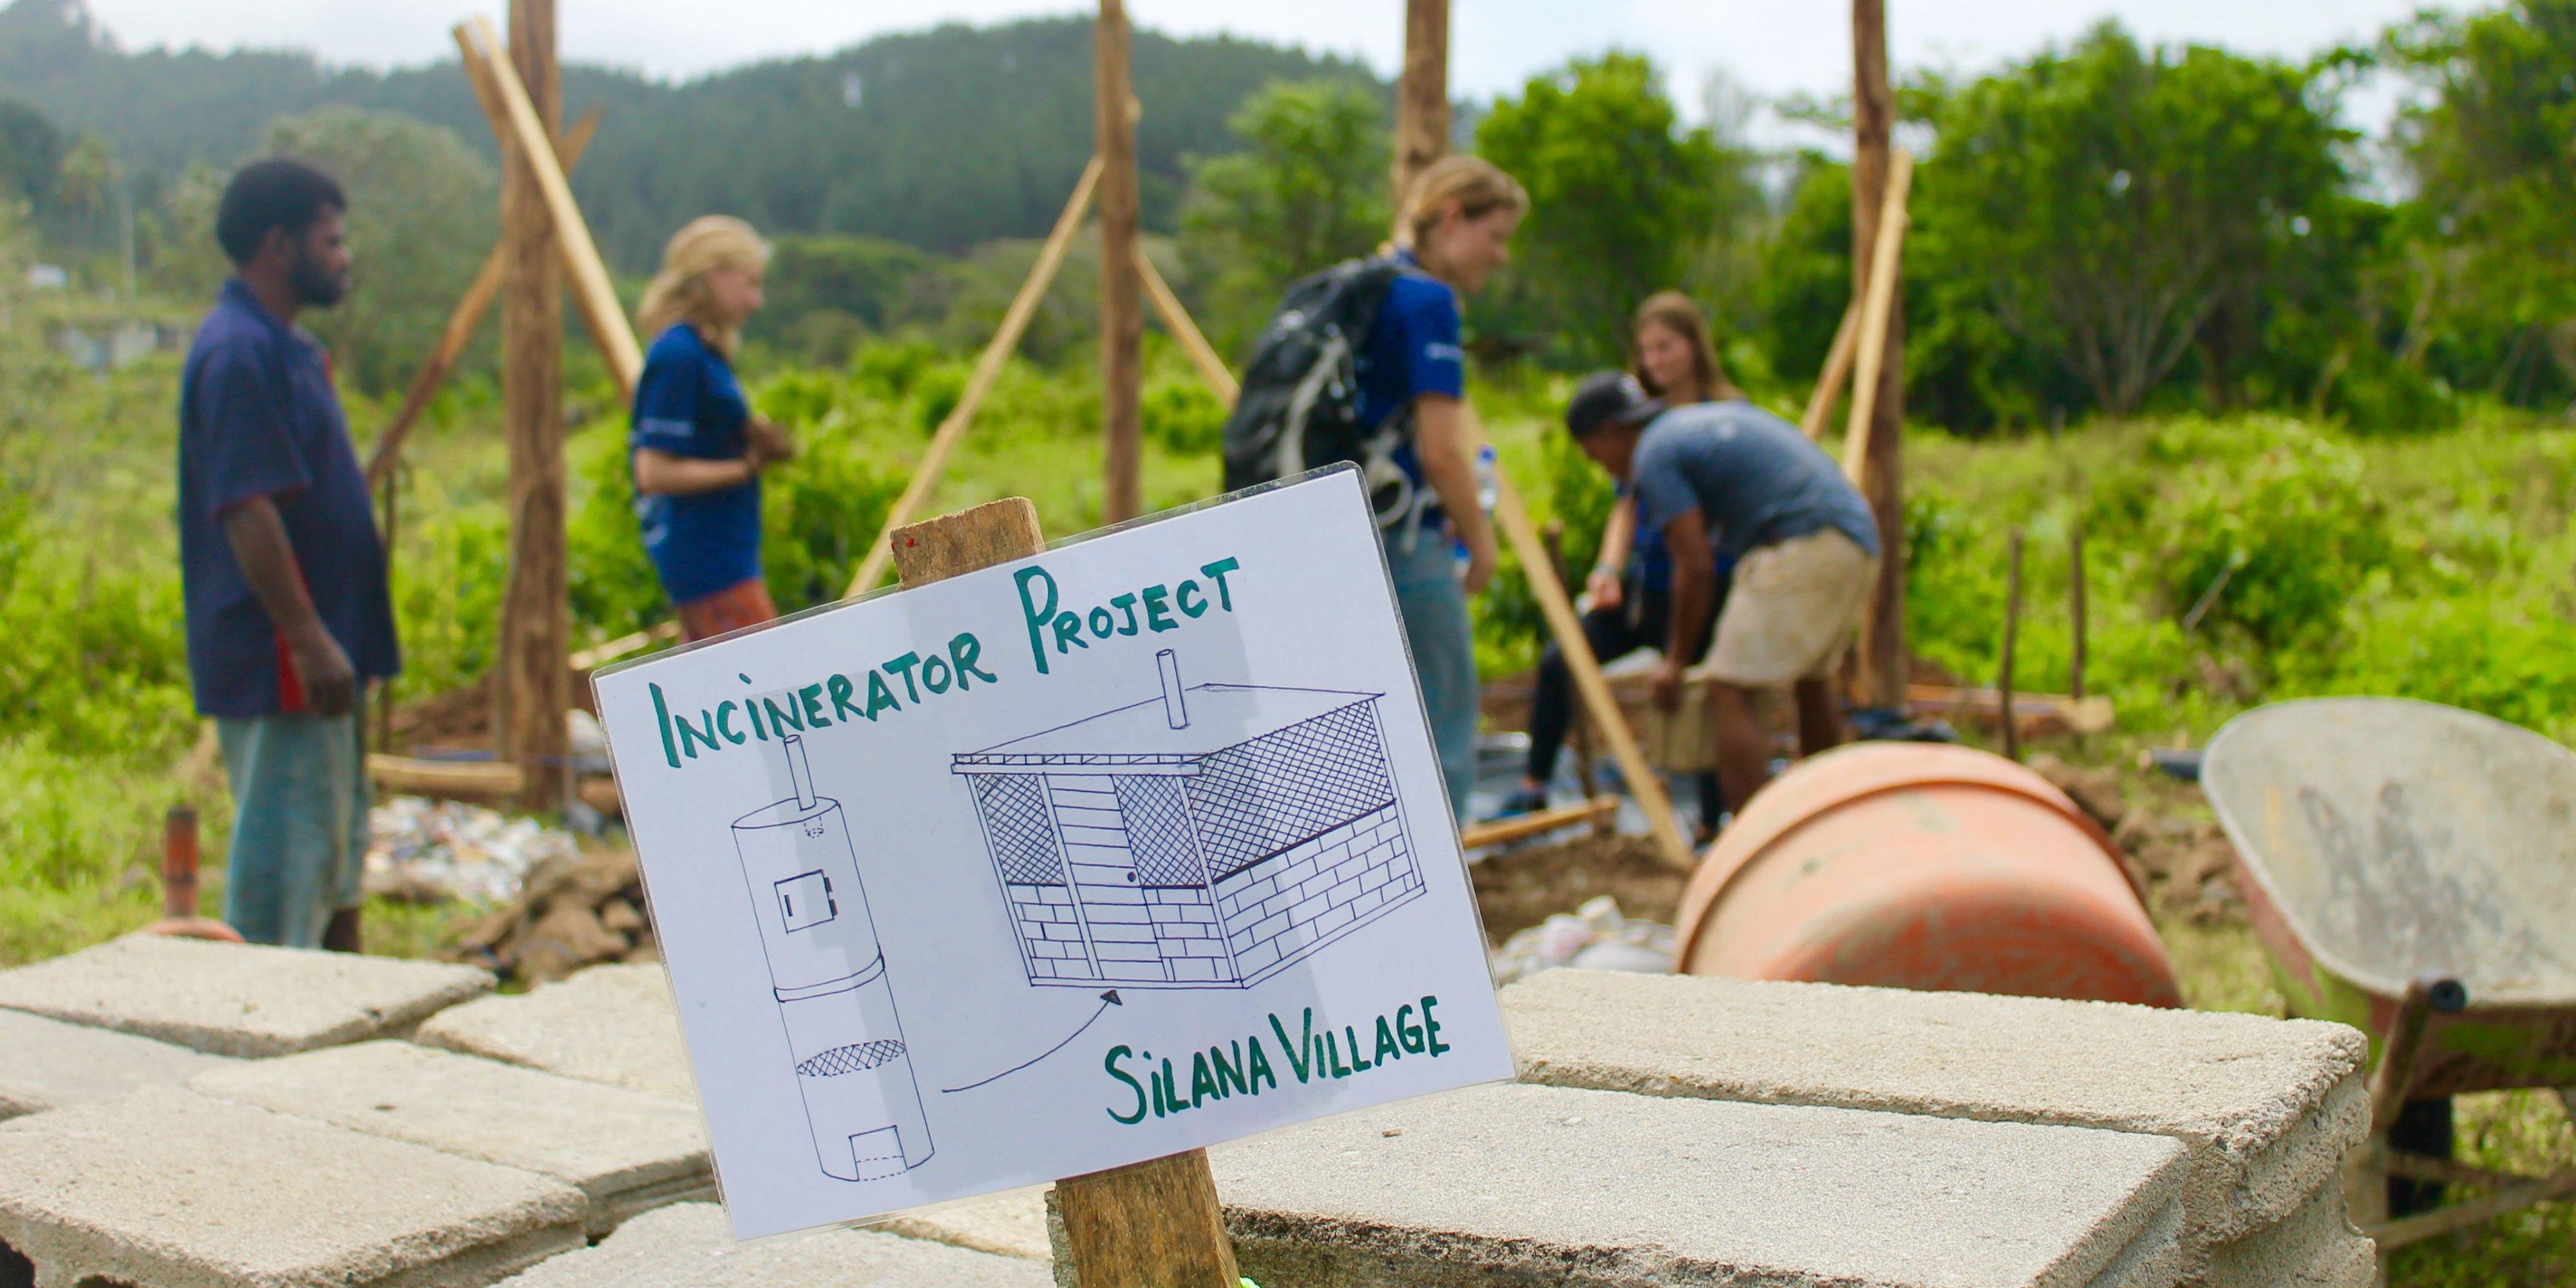 GVI volunteers doing agricultural work on a community development program. Volunteer work teaches leadership skills.